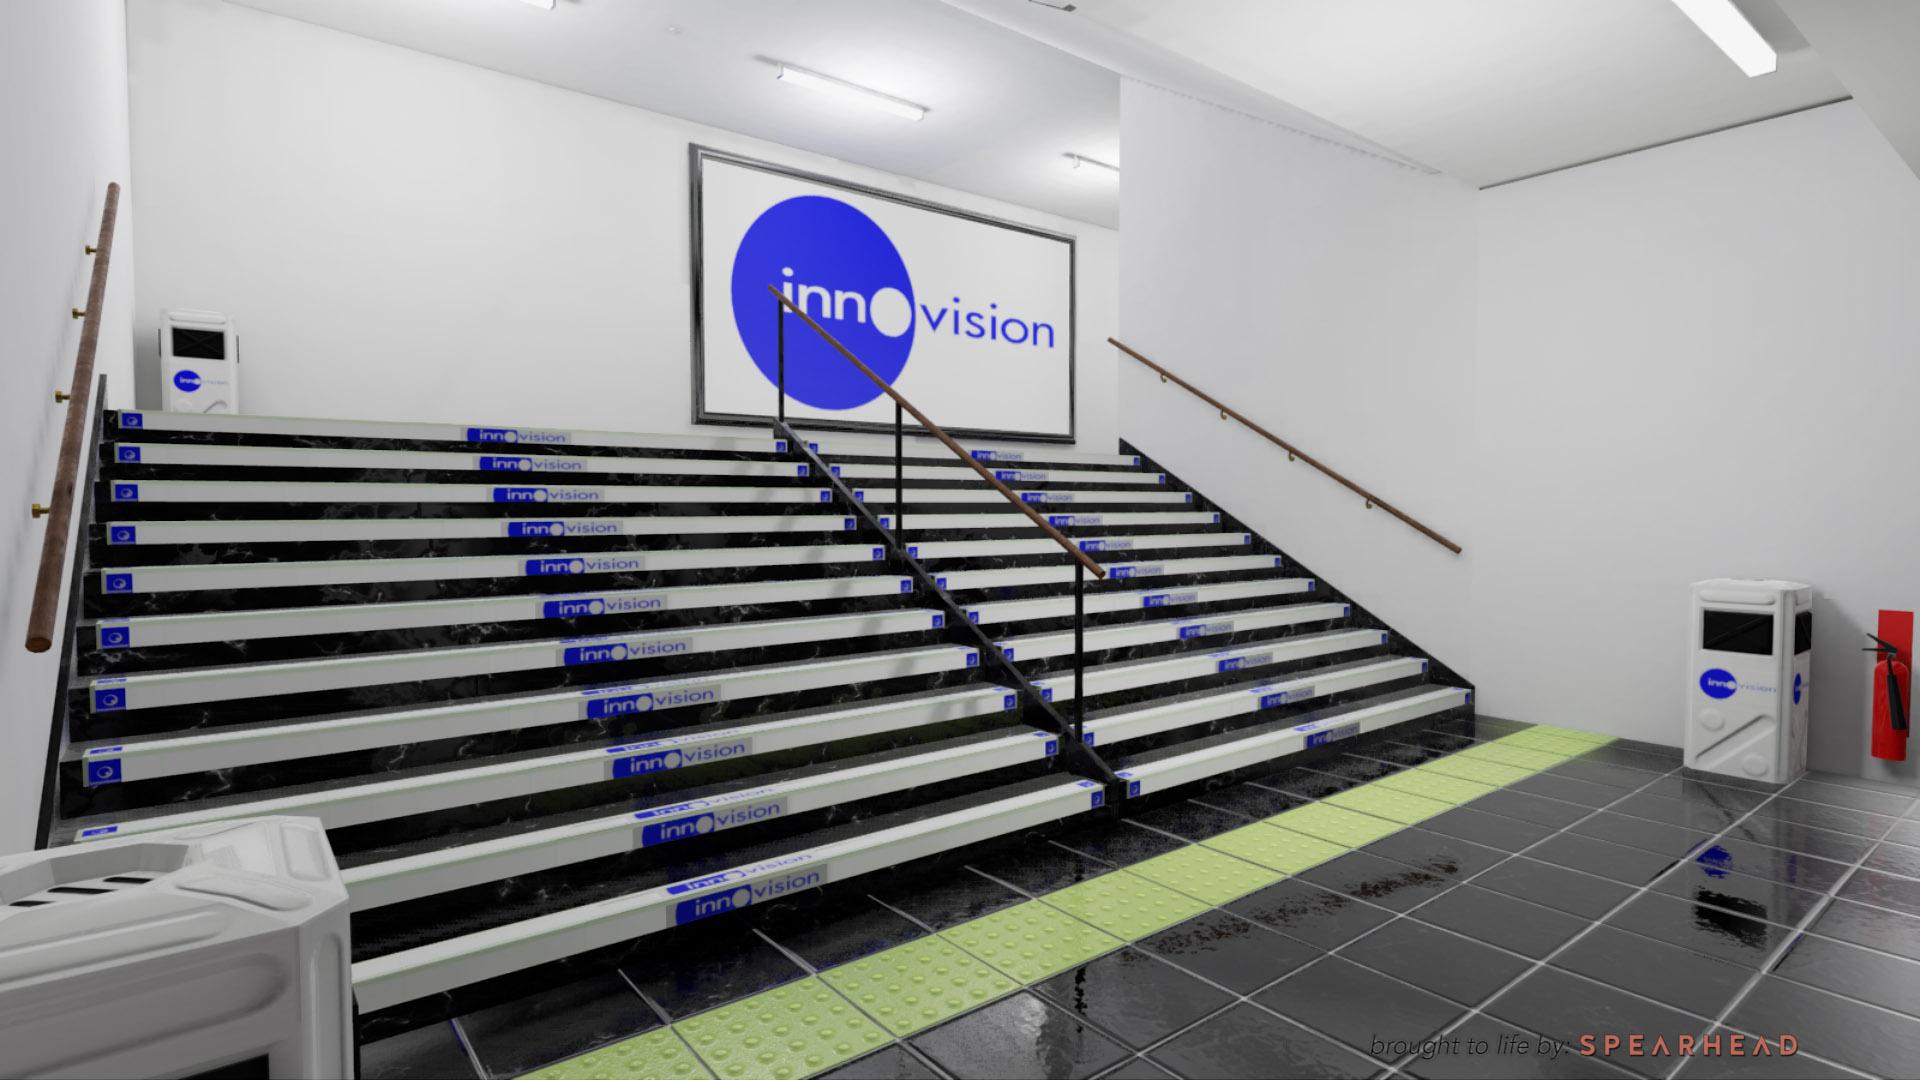 Innovision_Stairwell_0003_Normal.jpg